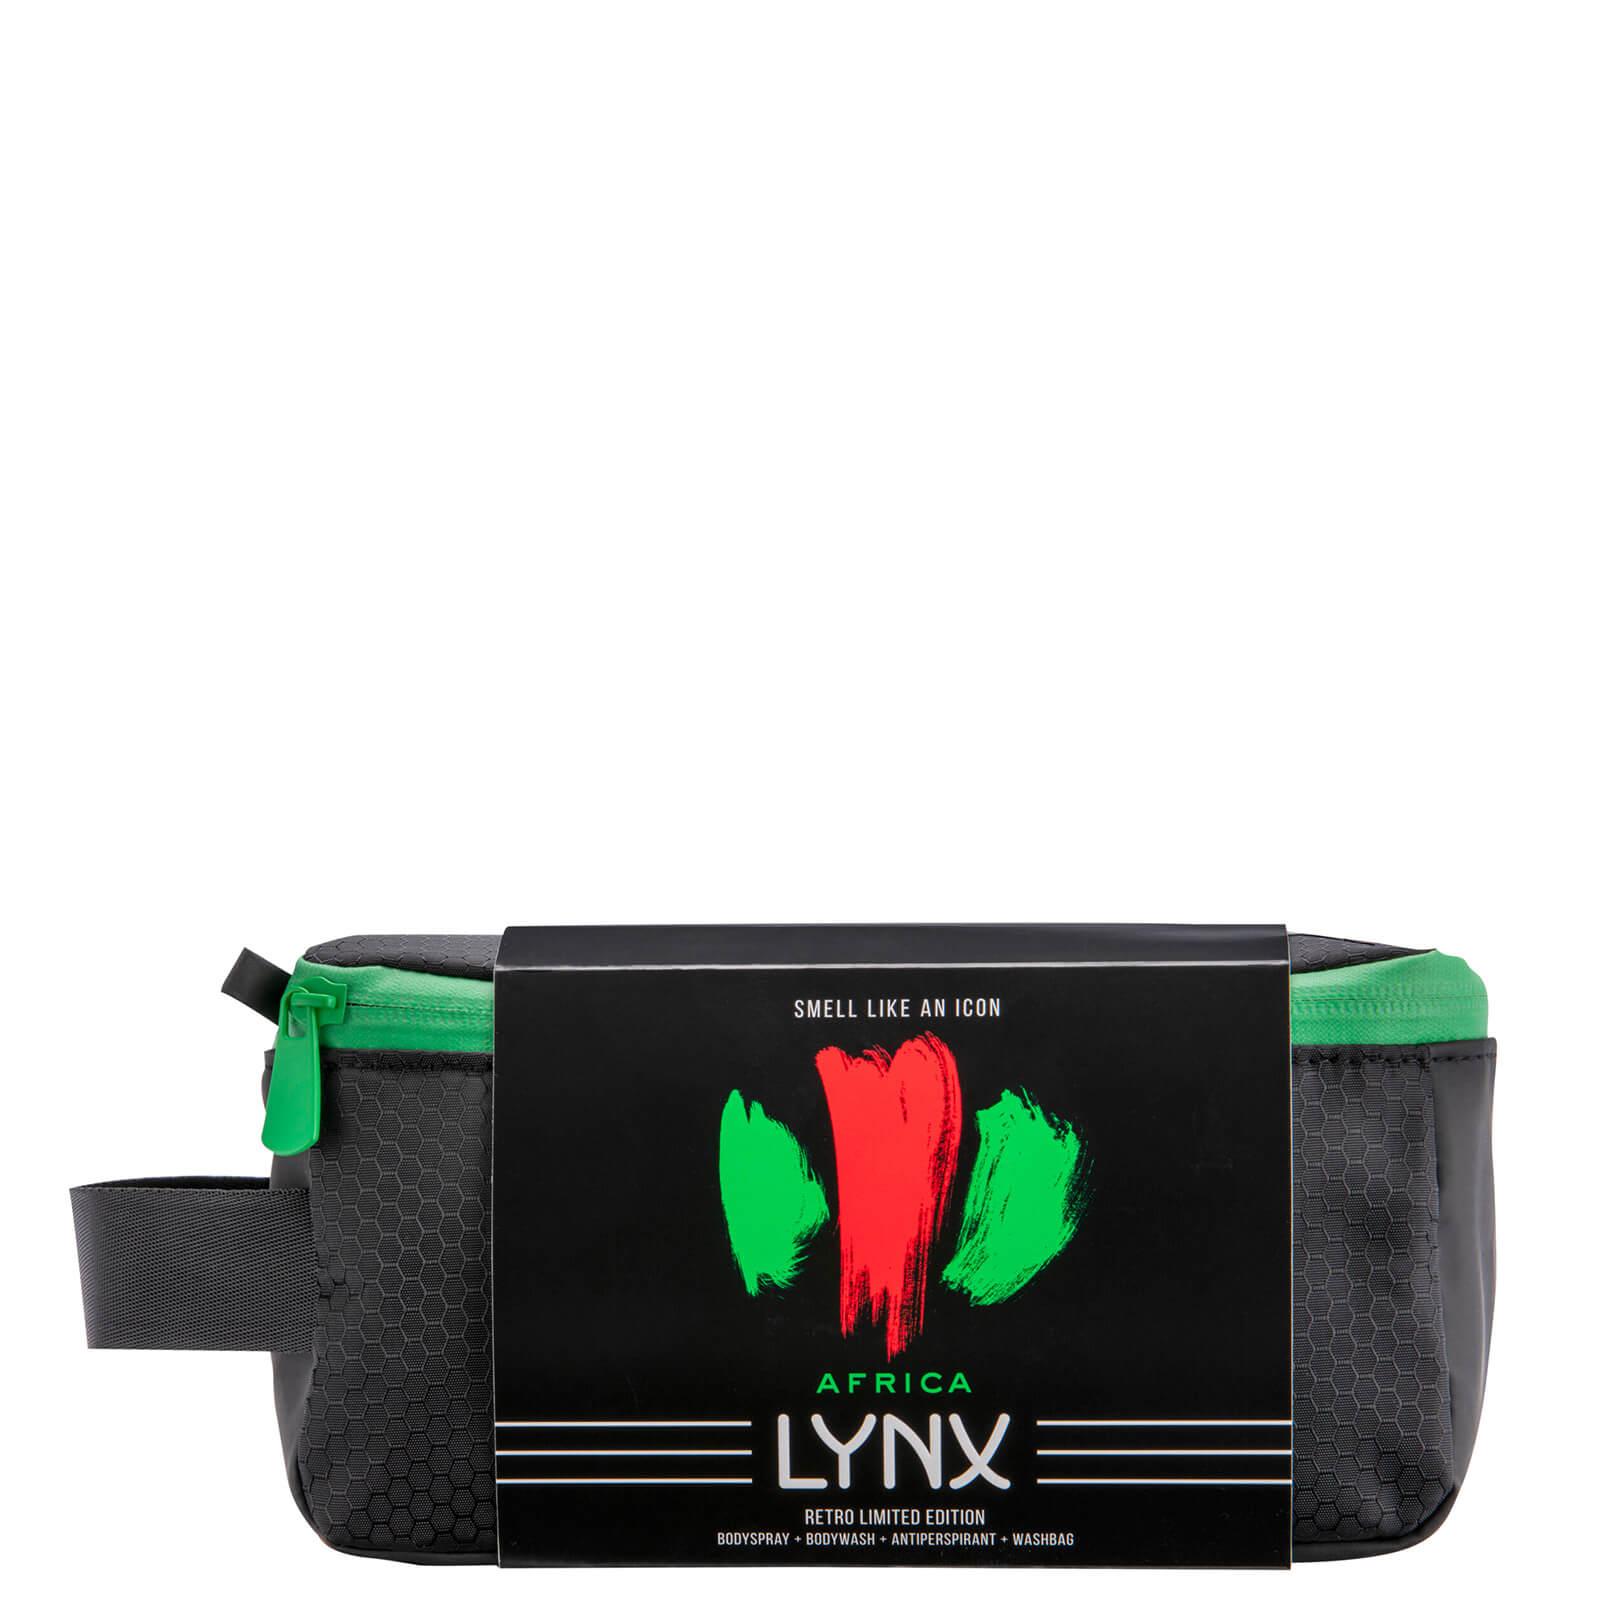 Lynx Classic Africa Washbag Gift Set